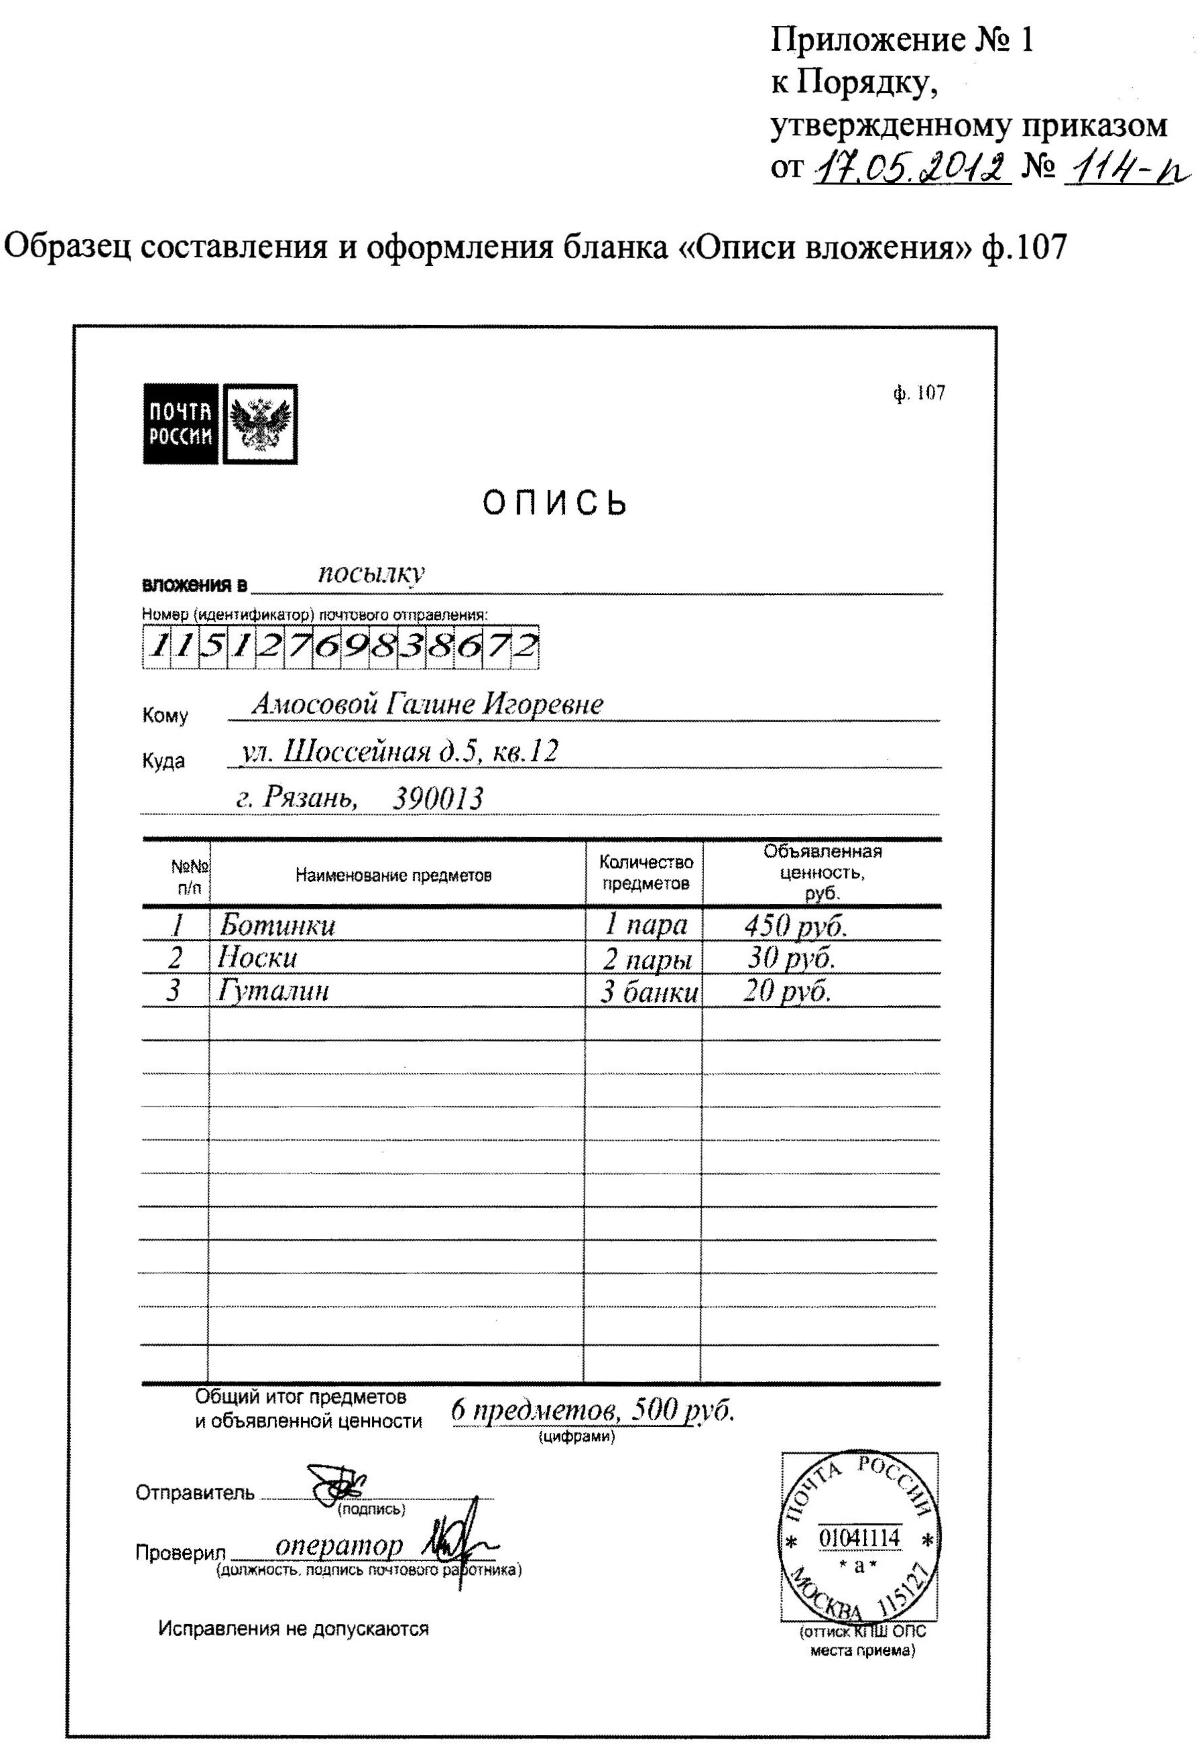 Почта россии форма 107 [PUNIQRANDLINE-(au-dating-names.txt) 64